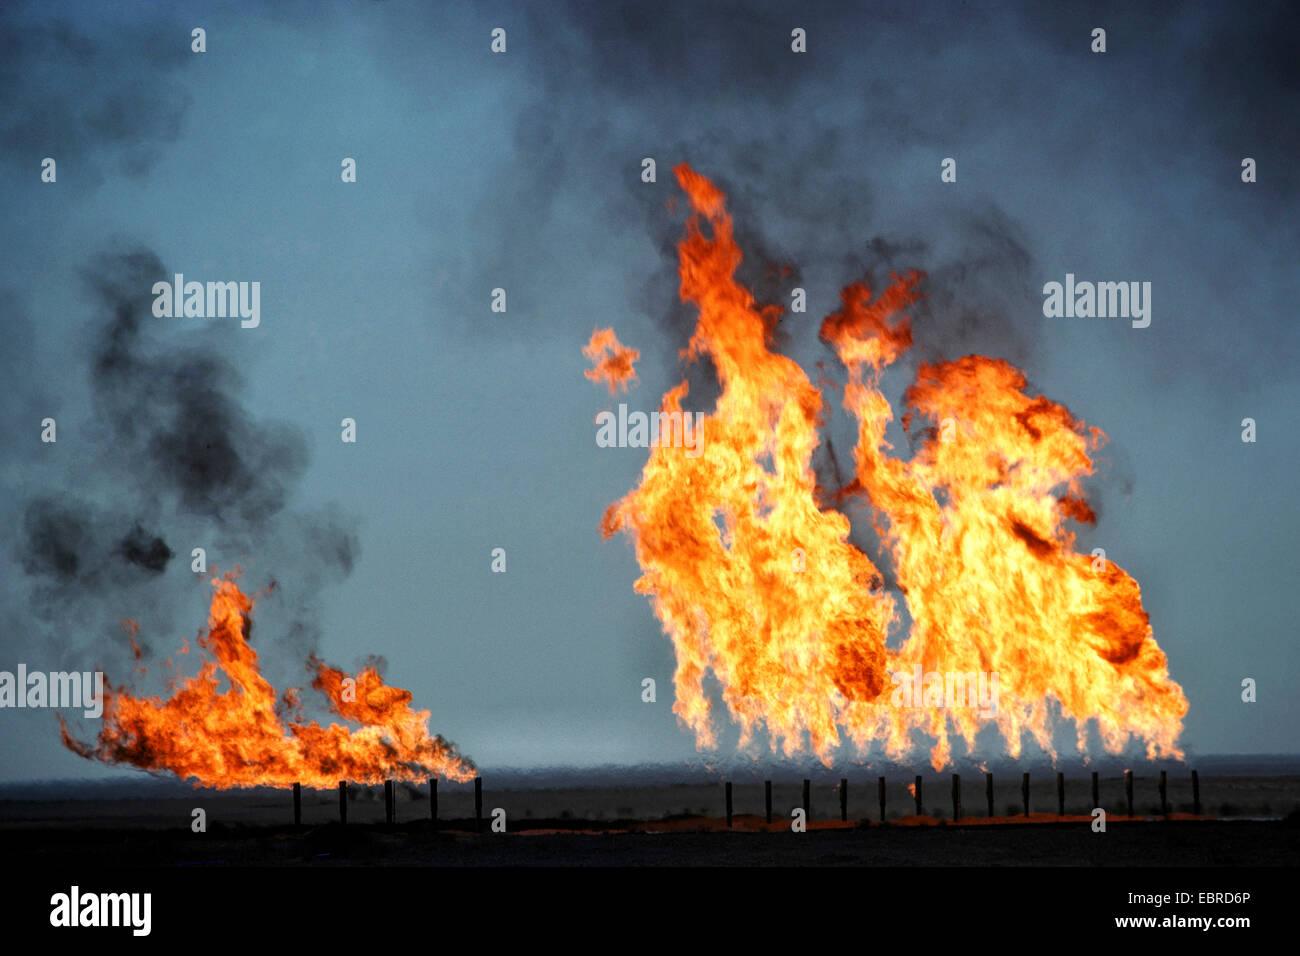 burning natural gas, Iraq, Rumaila - Stock Image